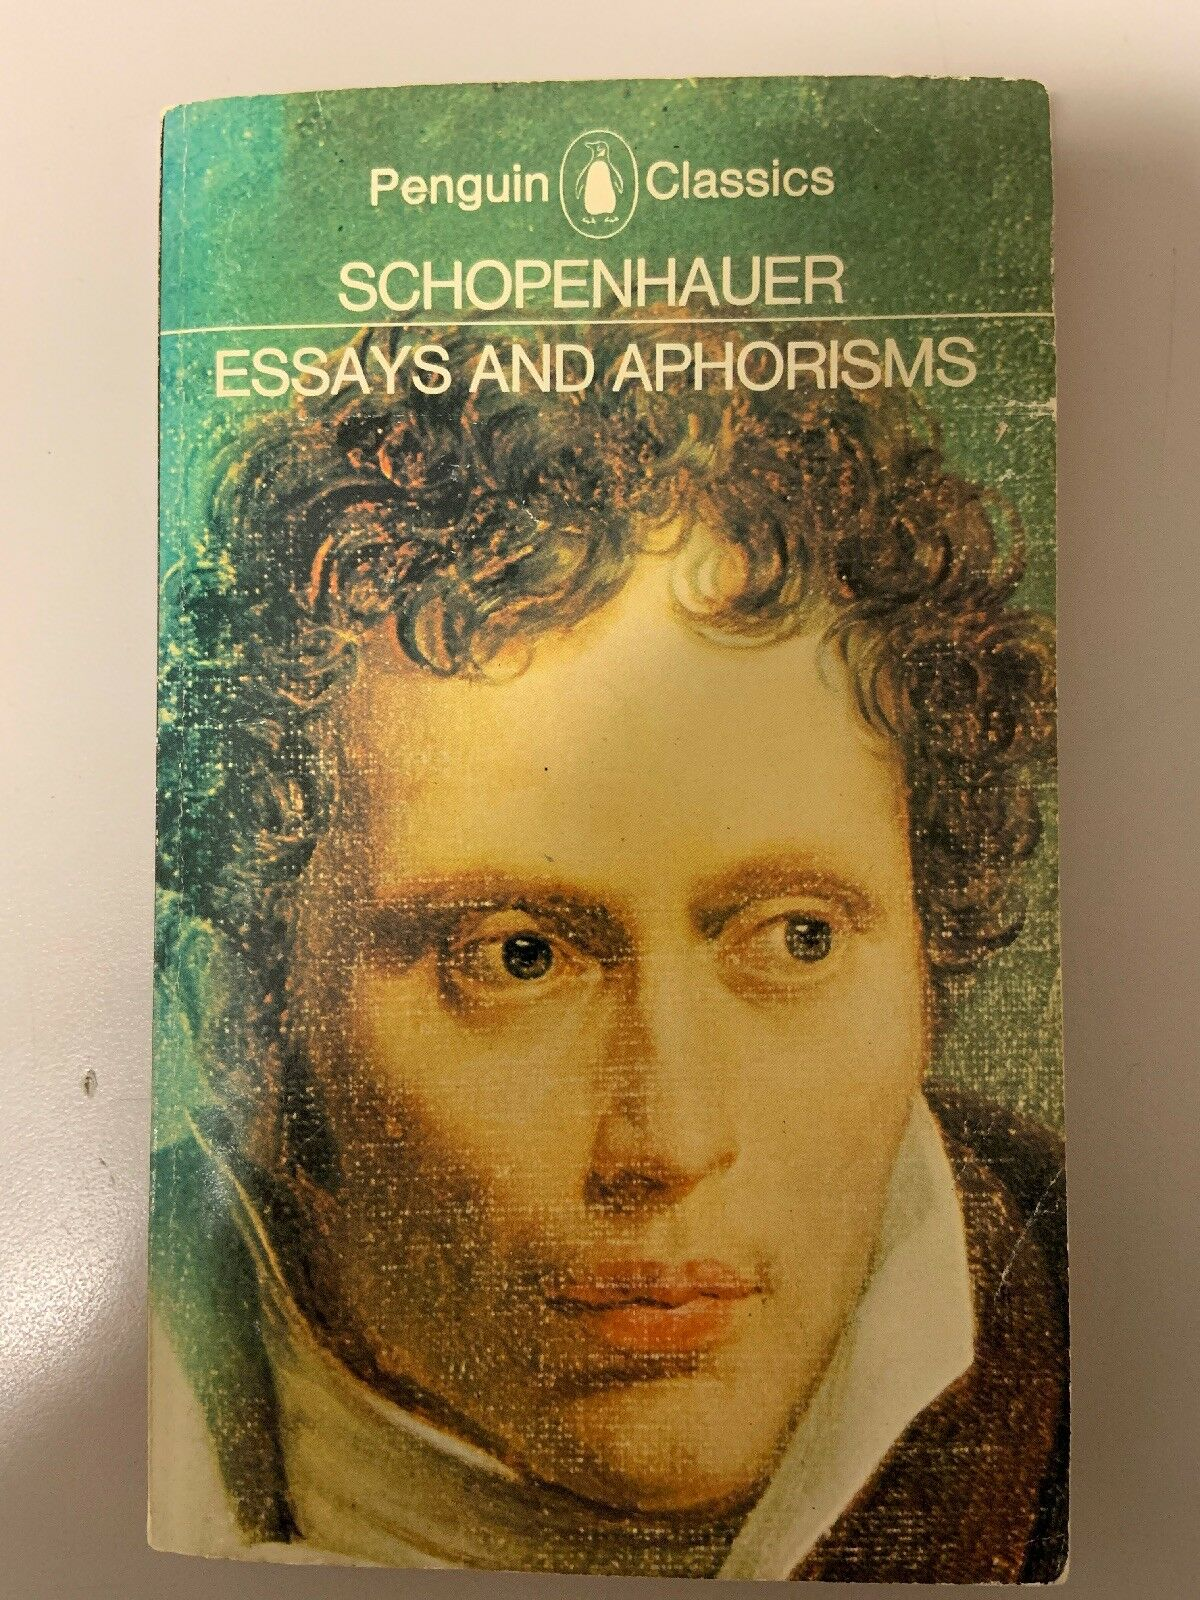 006 S L1600 Essays And Aphorisms Essay Frightening By Arthur Schopenhauer Pdf Full